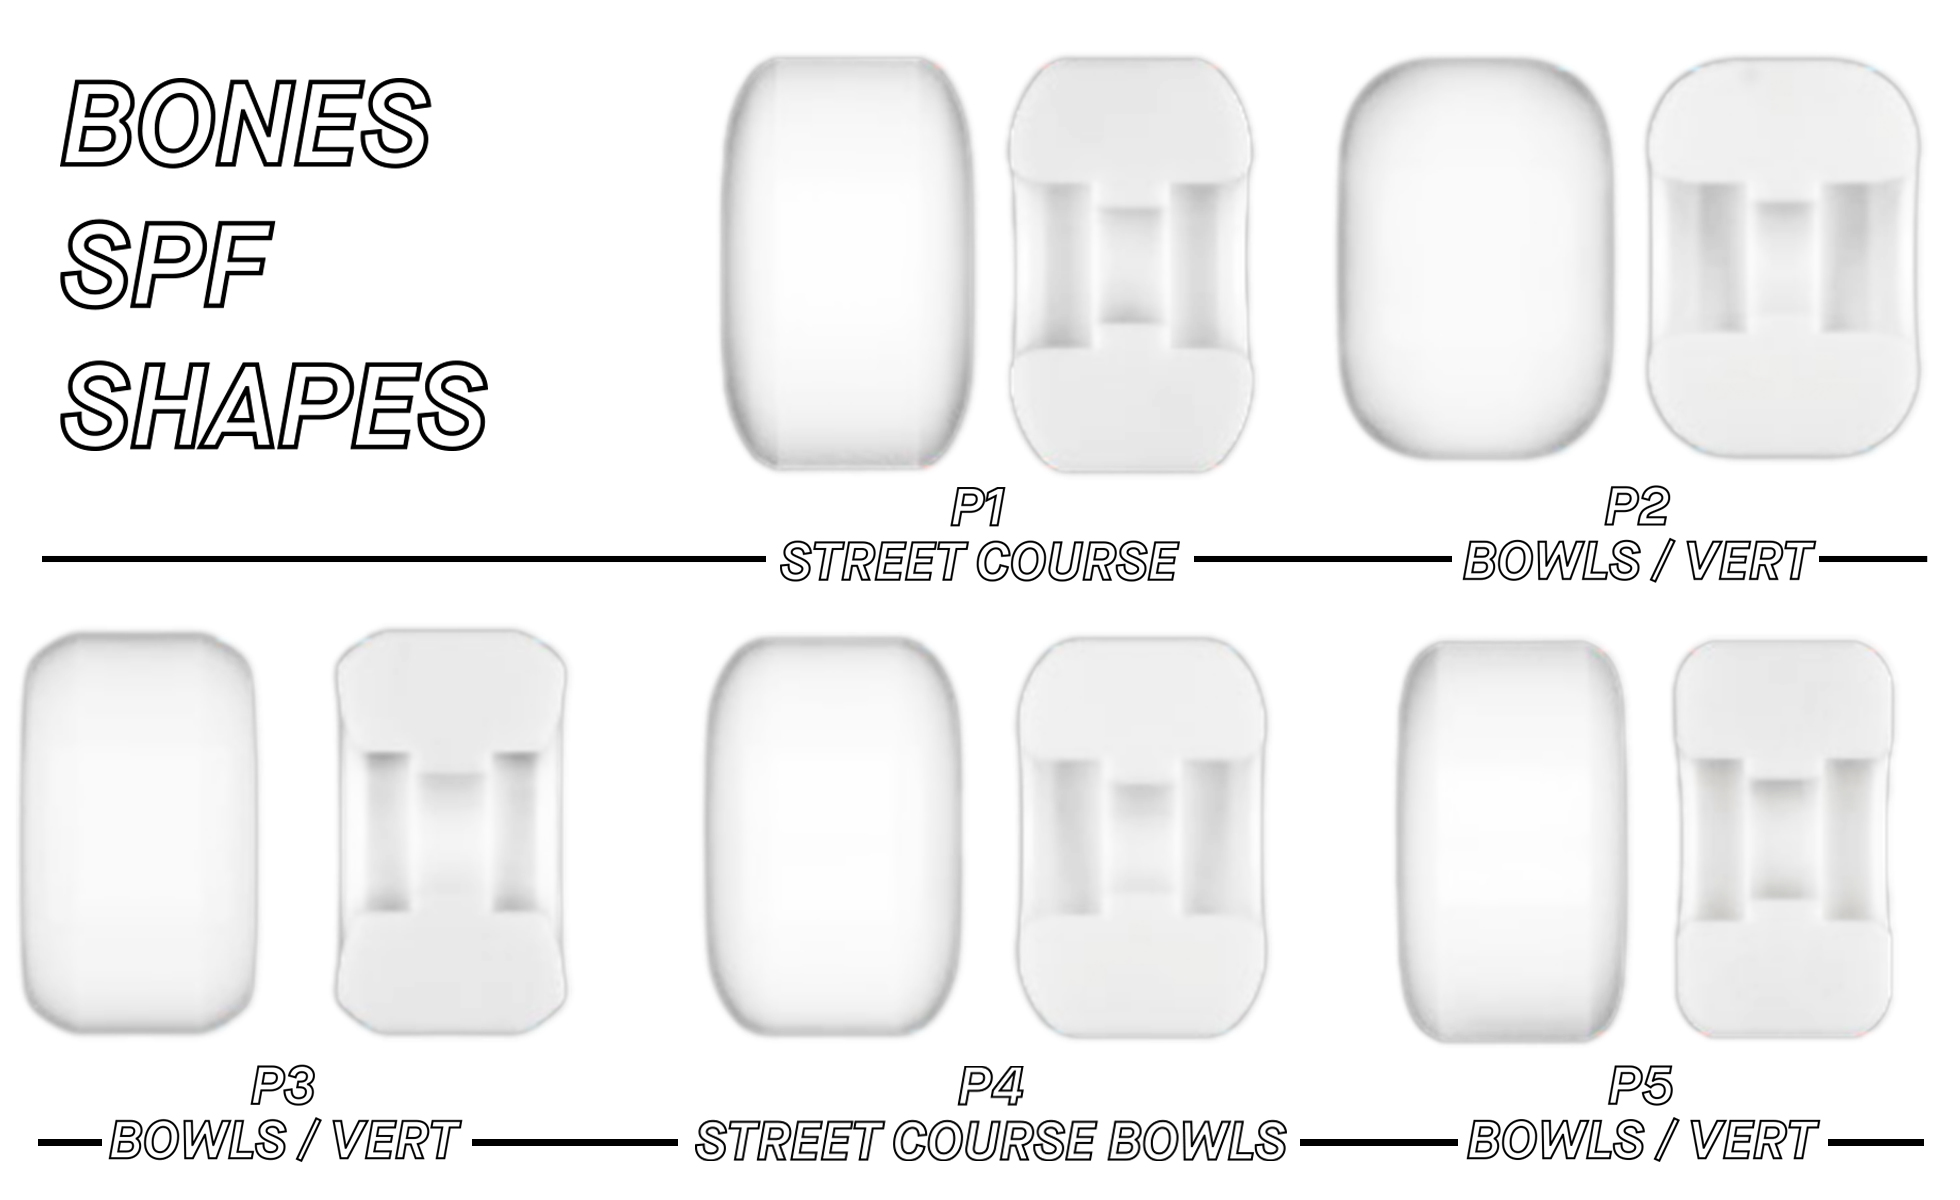 Bones Wheels Buyer Guide - Bones SPF Wheel Sizes and Shapes